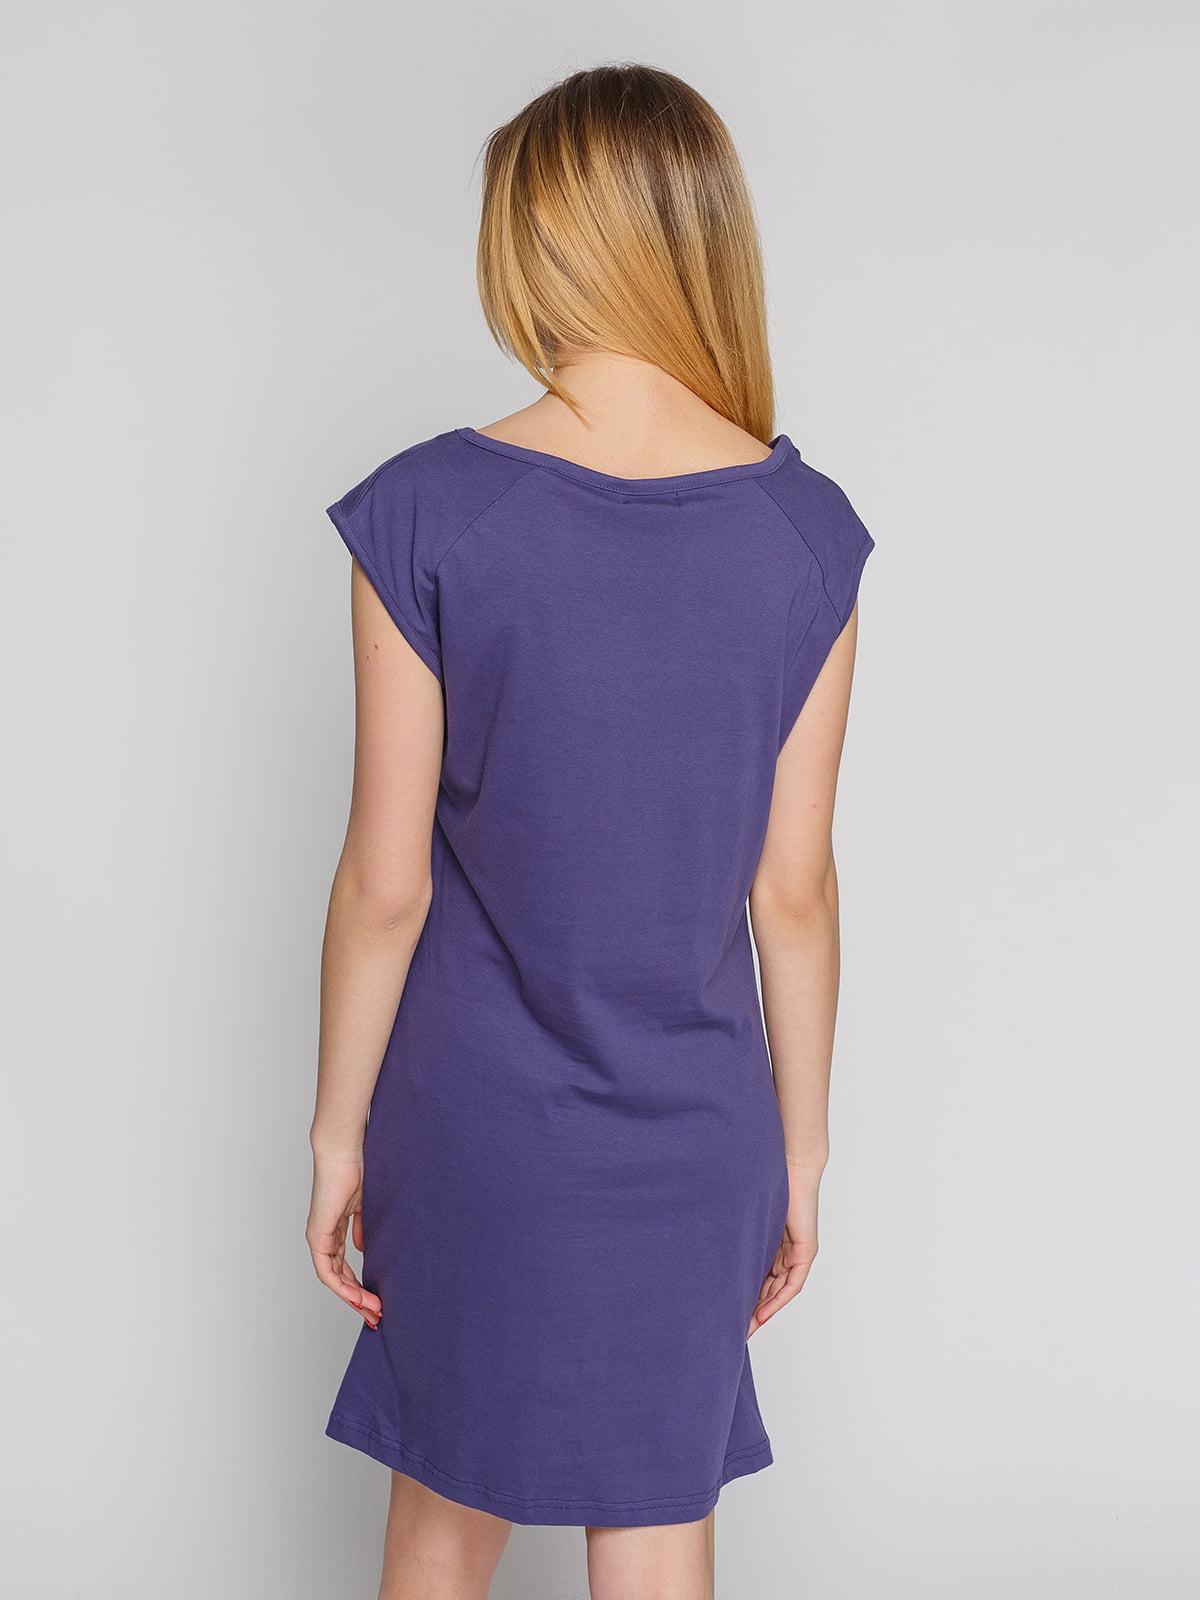 Сукня темно-фіолетова | 4855333 | фото 2